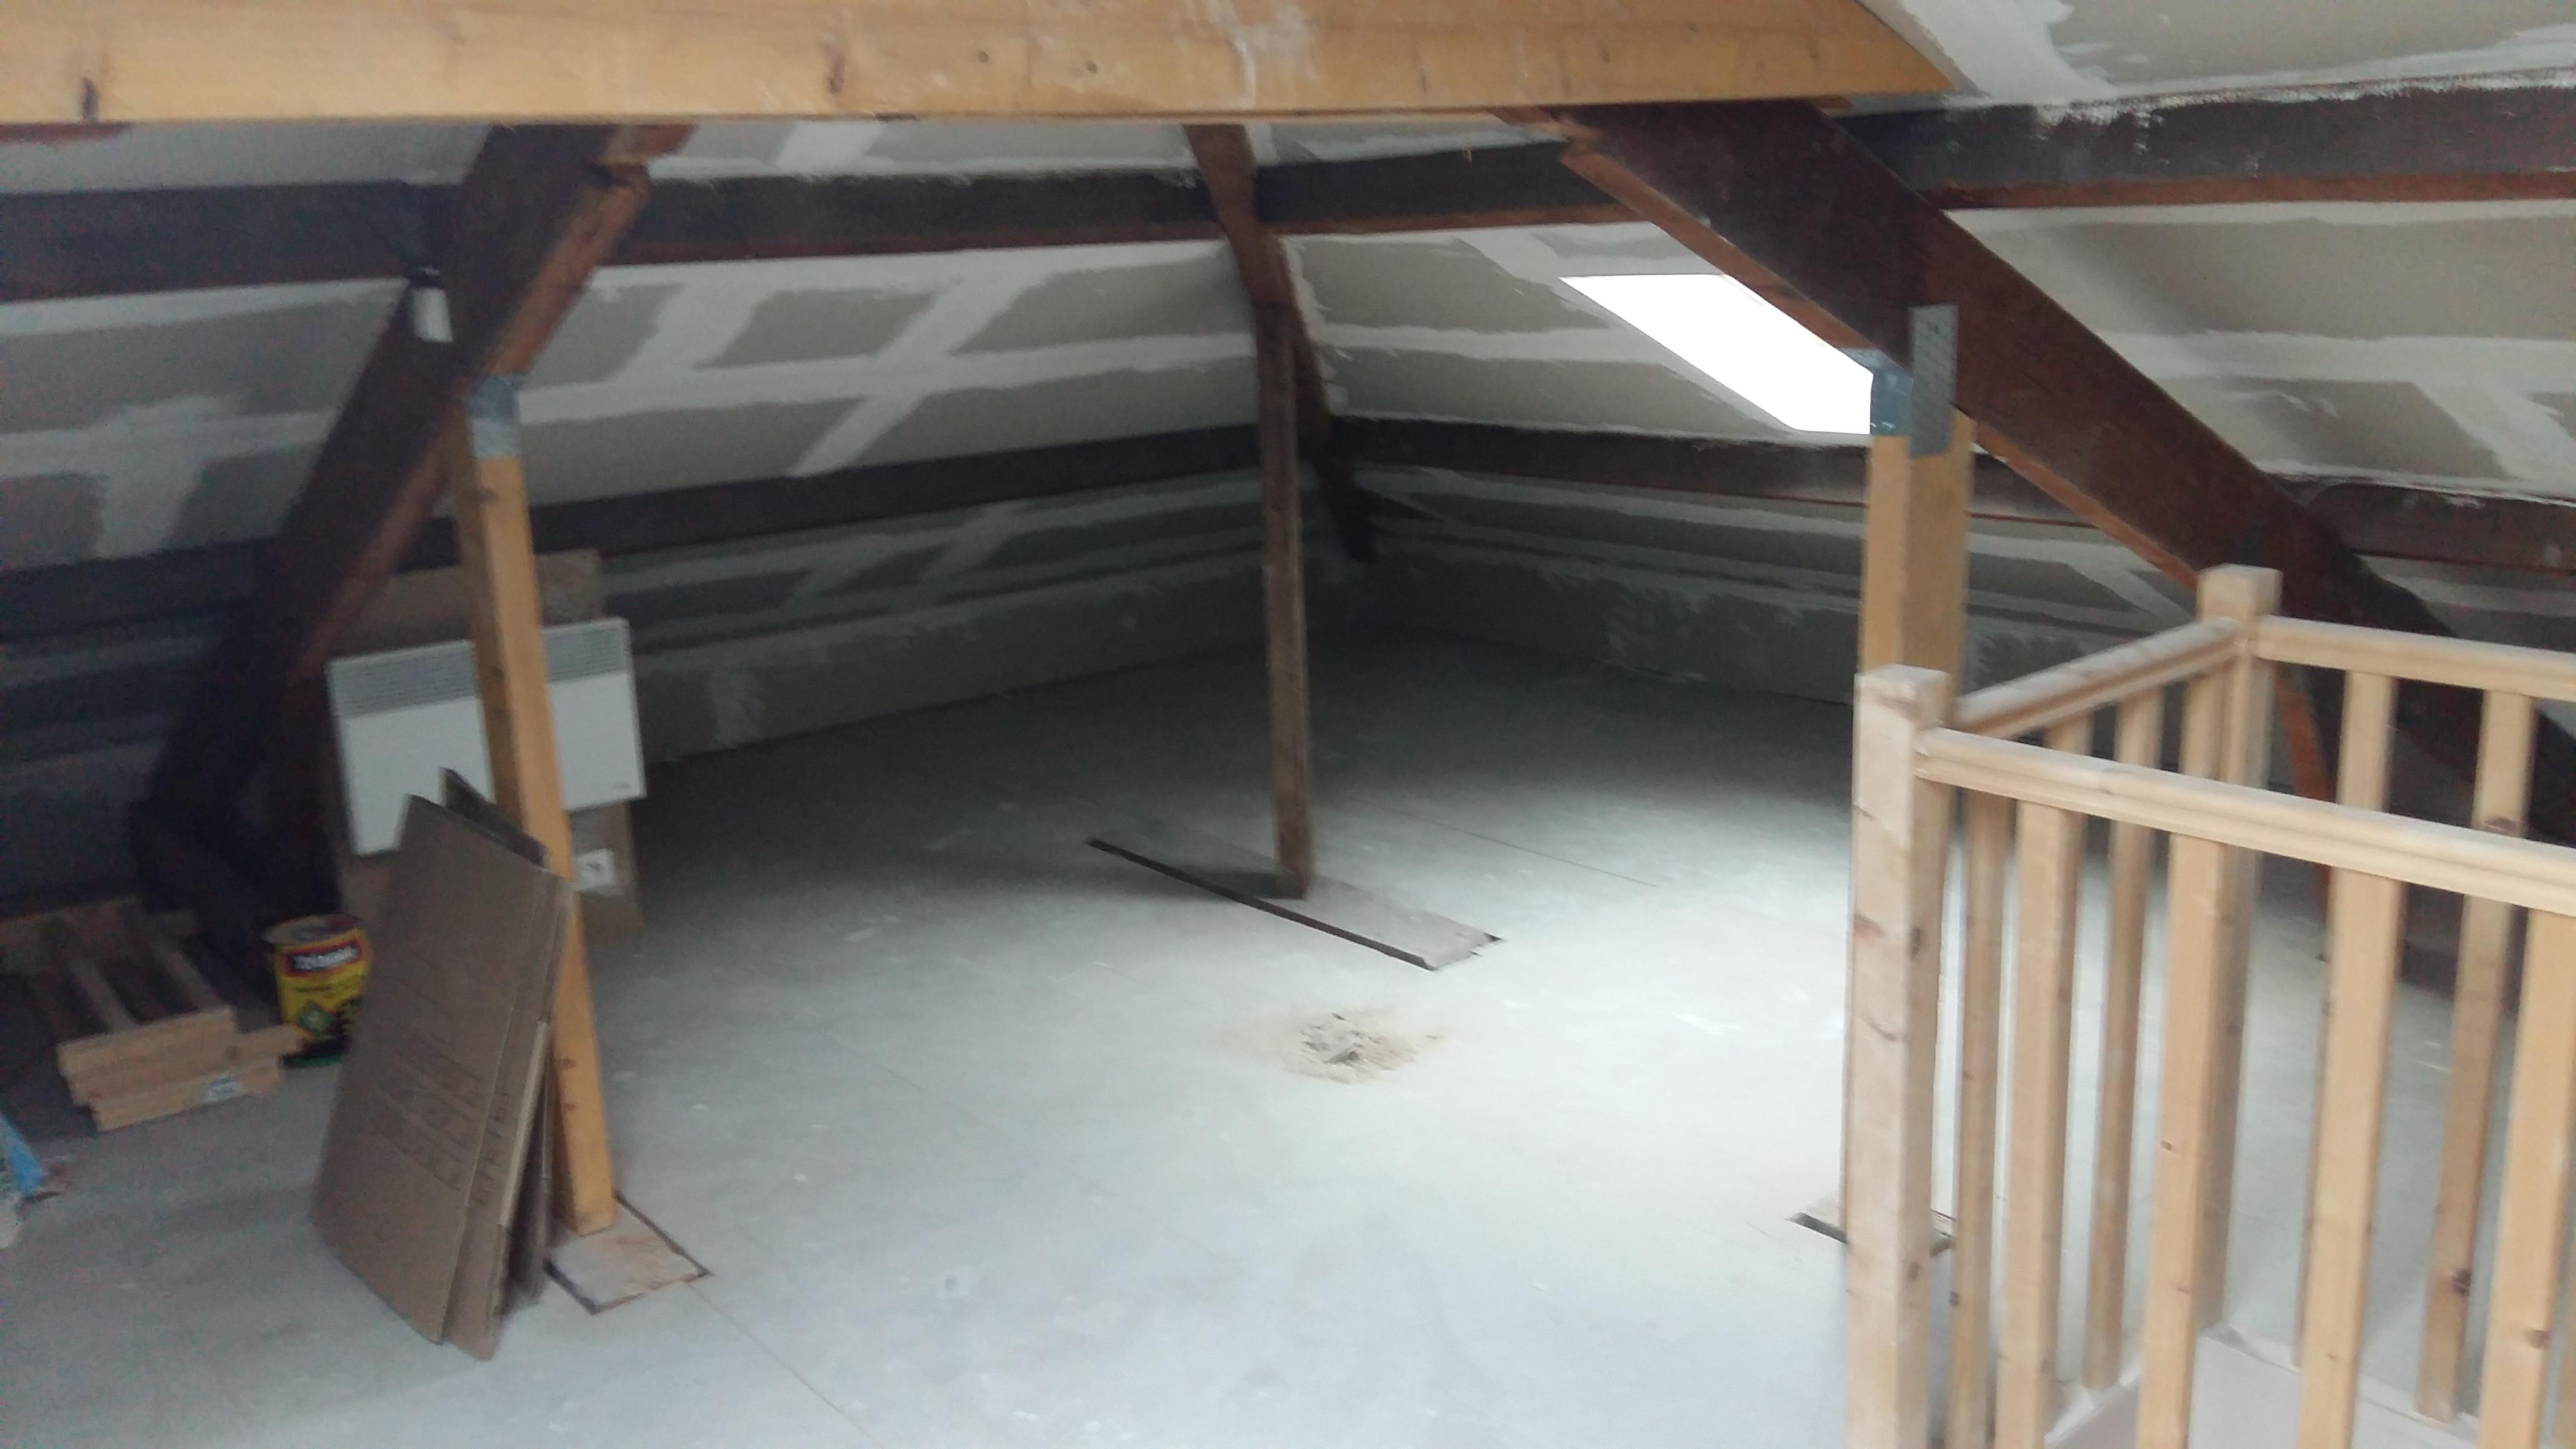 location 4m2 de stockage dans local s curis savigny sur orge 91600. Black Bedroom Furniture Sets. Home Design Ideas